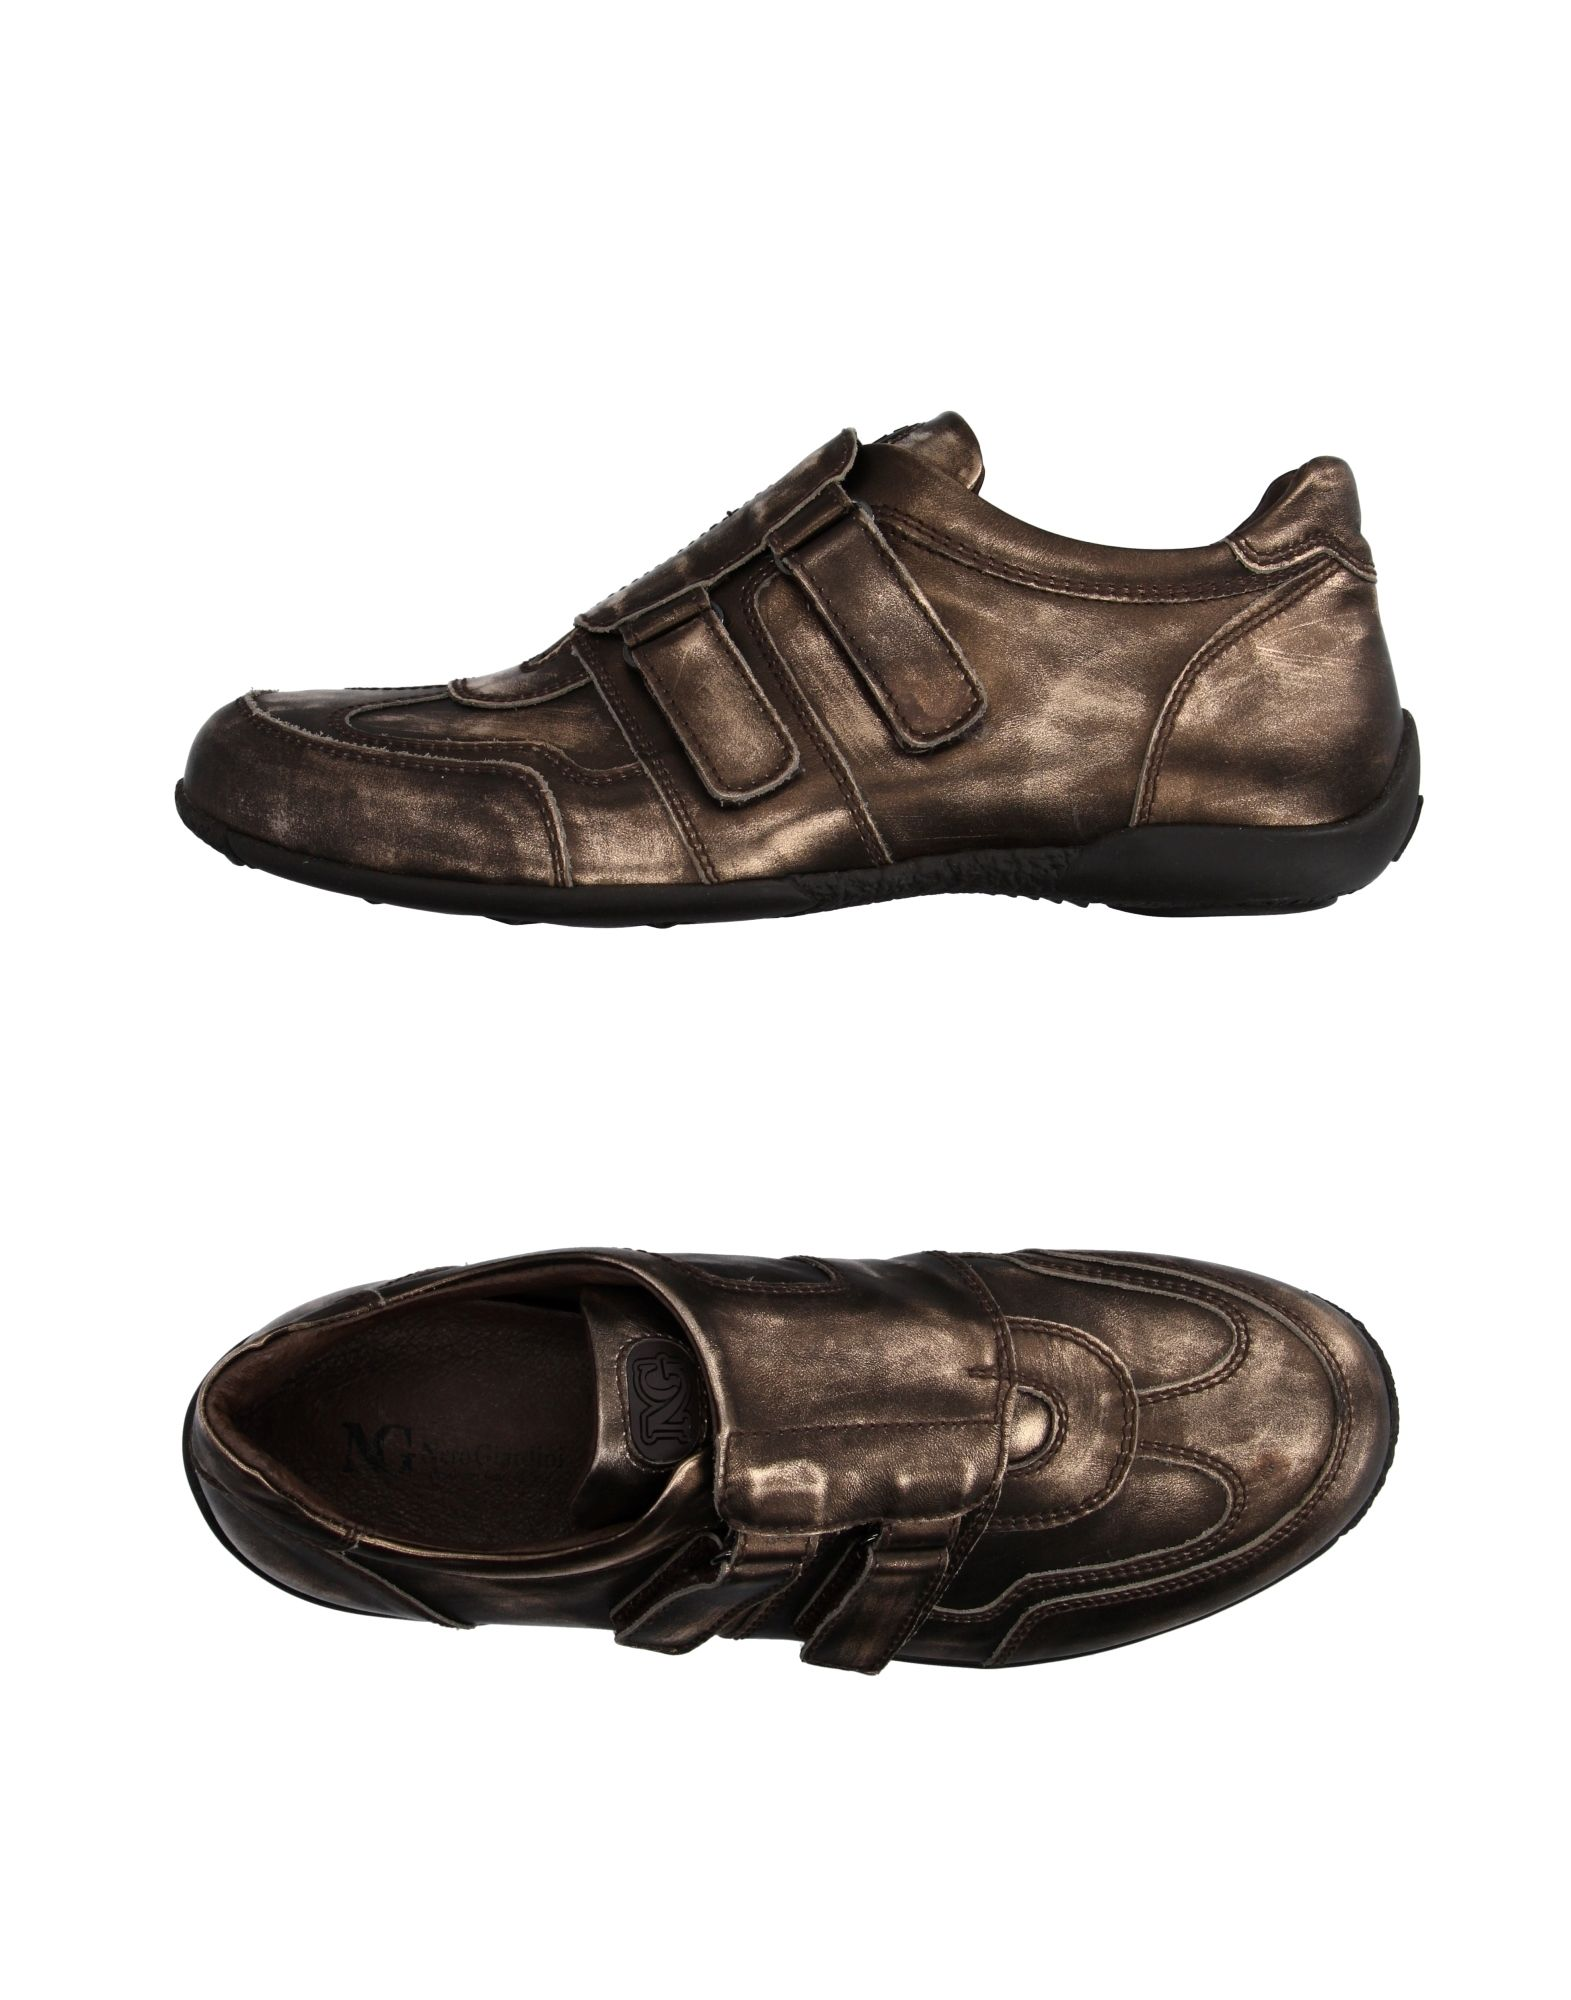 Rabatt echte Schuhe Ng Nero Giardini Sneakers Herren  11062085MG